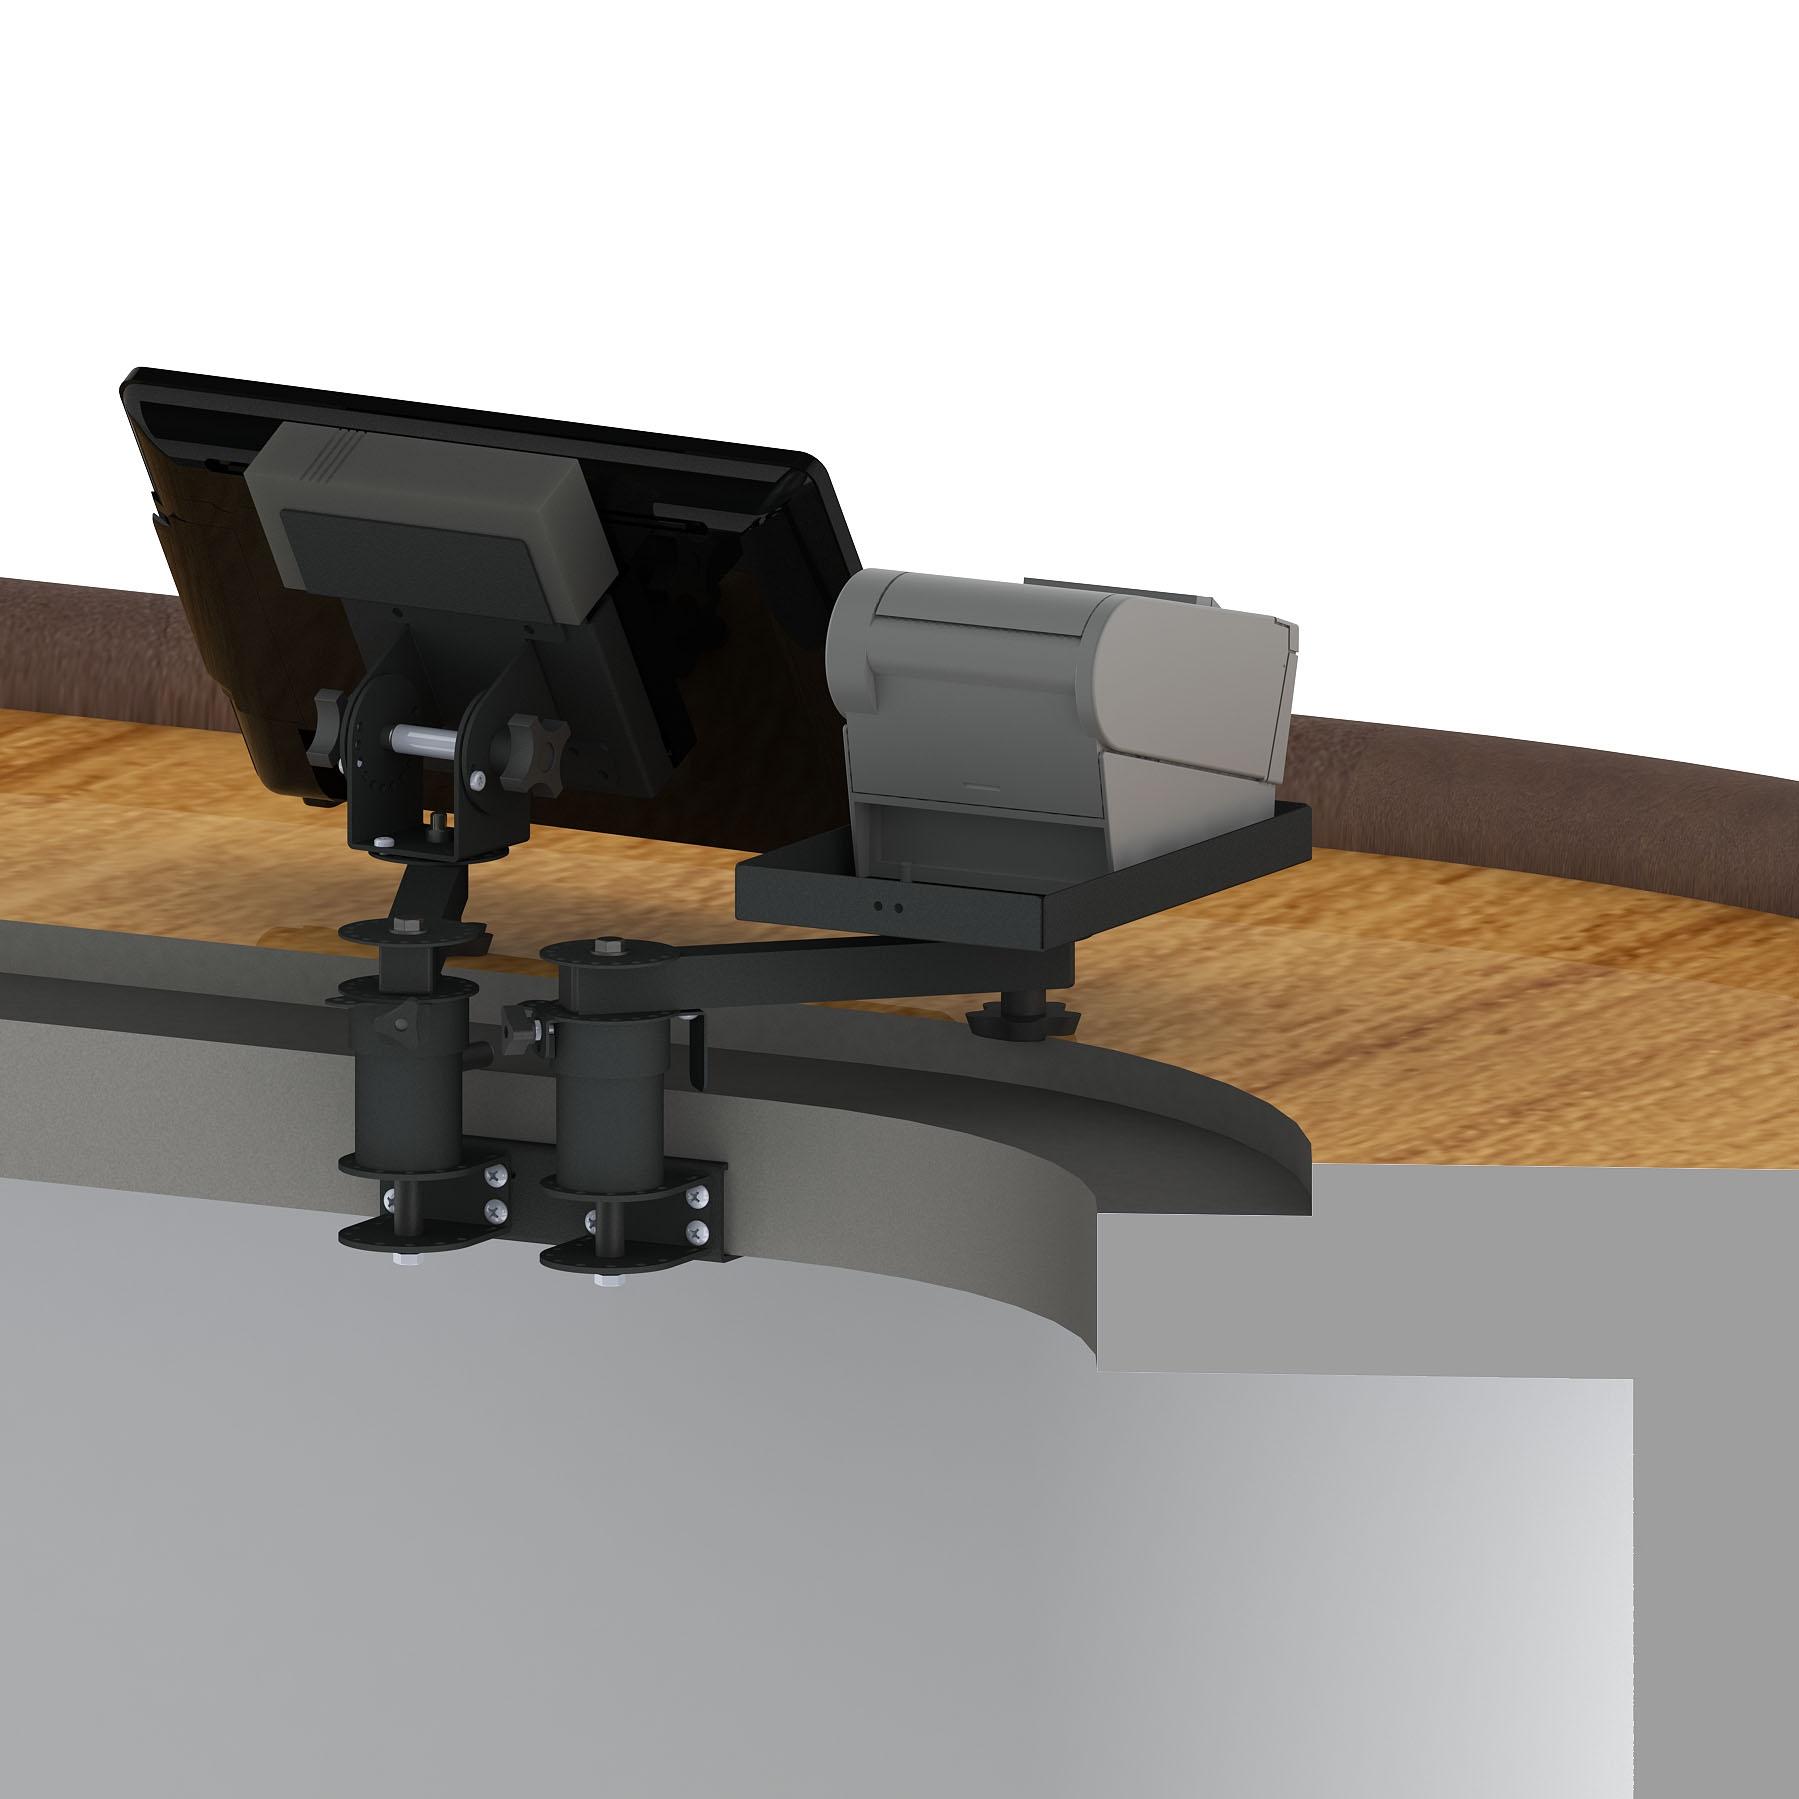 Shelf Edge Mounts for Screens and Printers